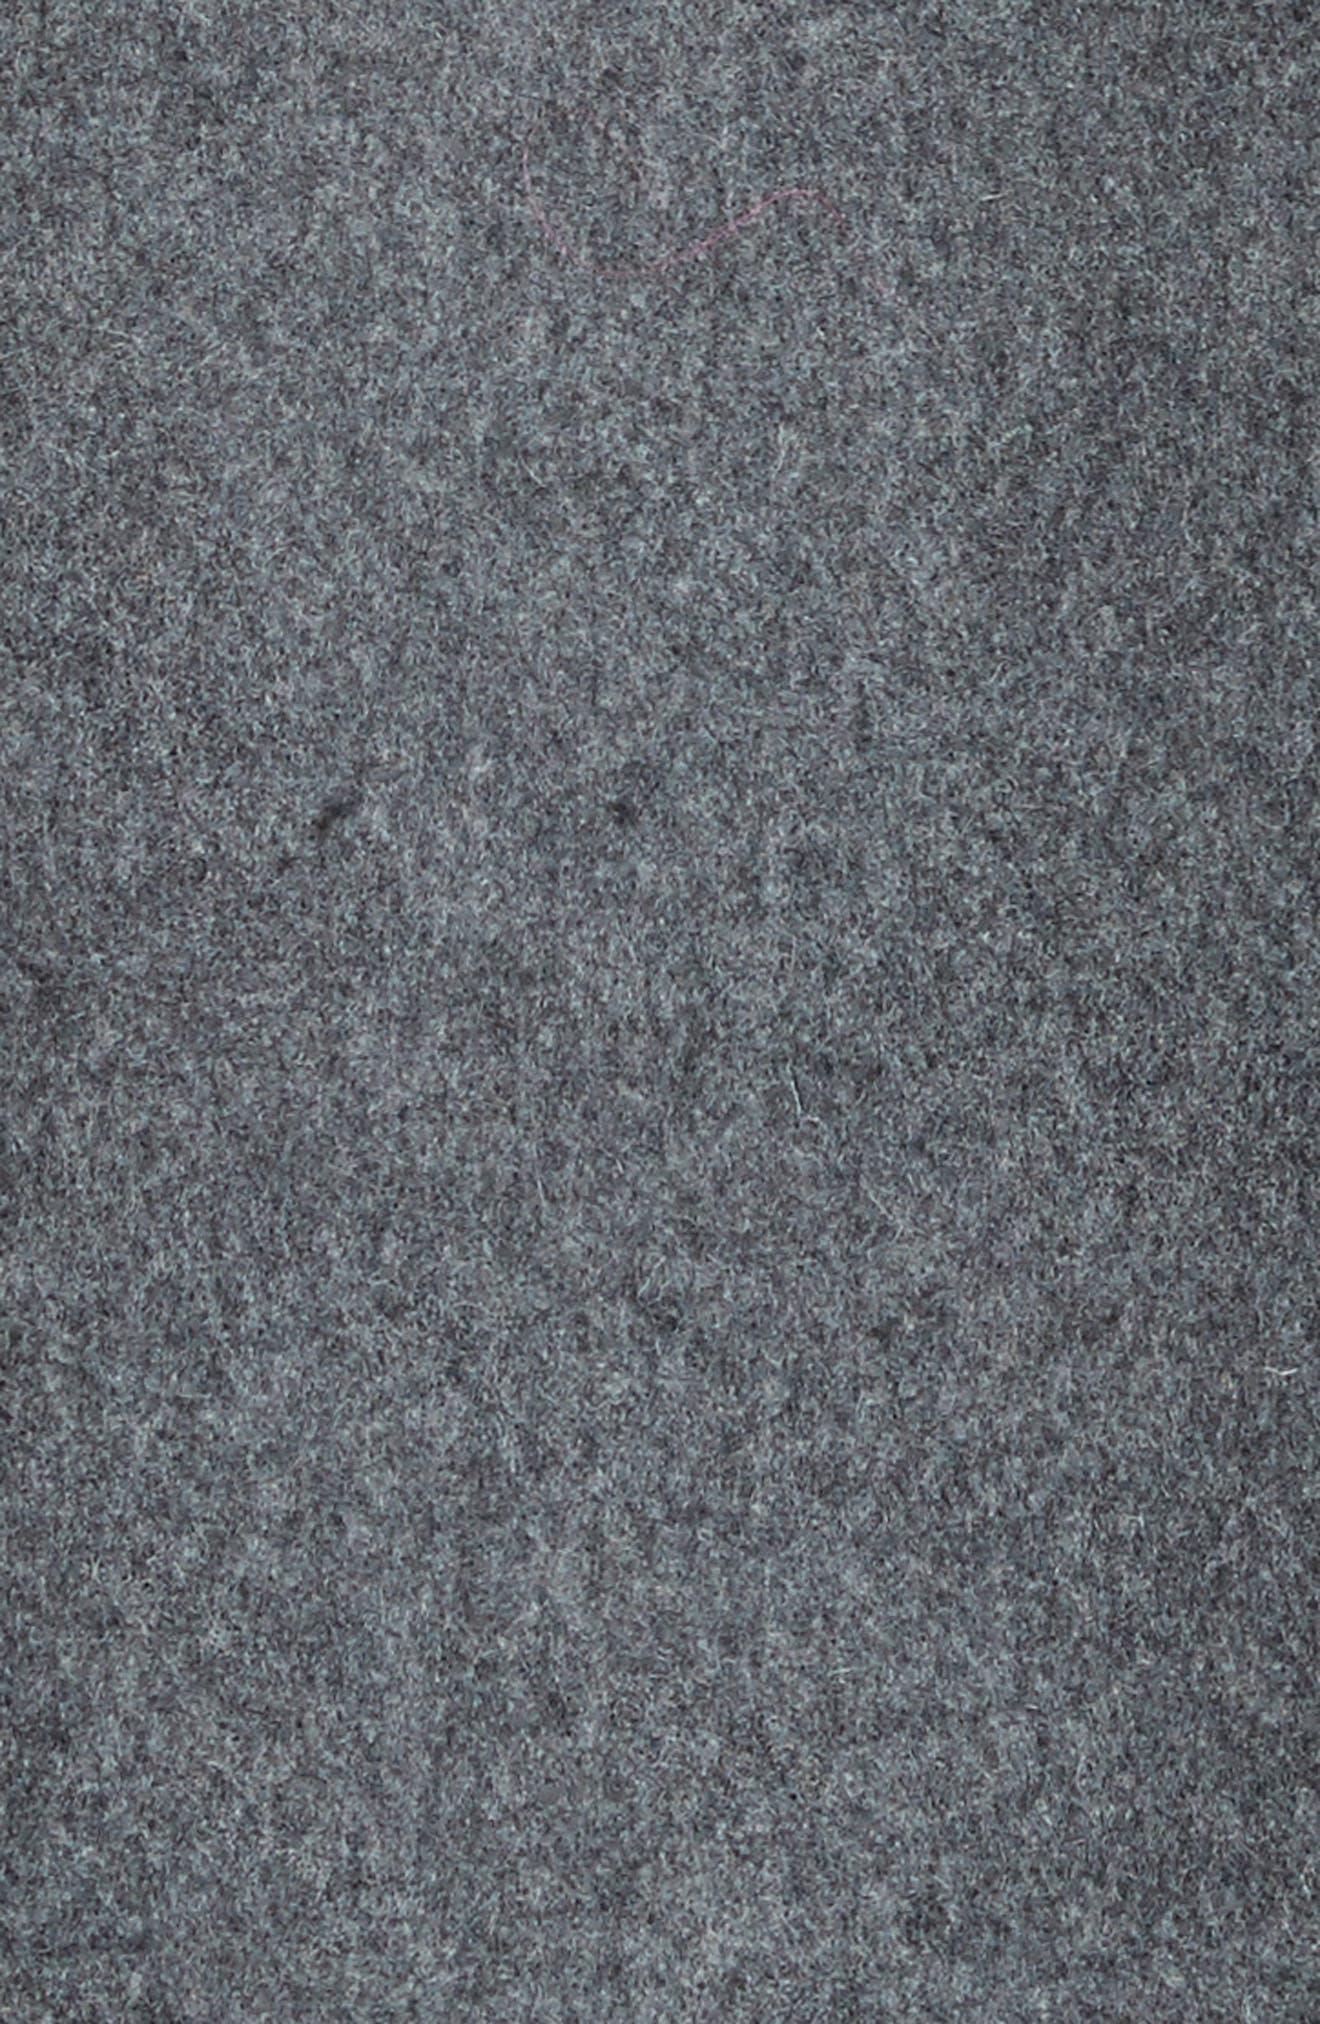 Edwina Long Double Breasted Wool Blend Coat,                             Alternate thumbnail 6, color,                             076